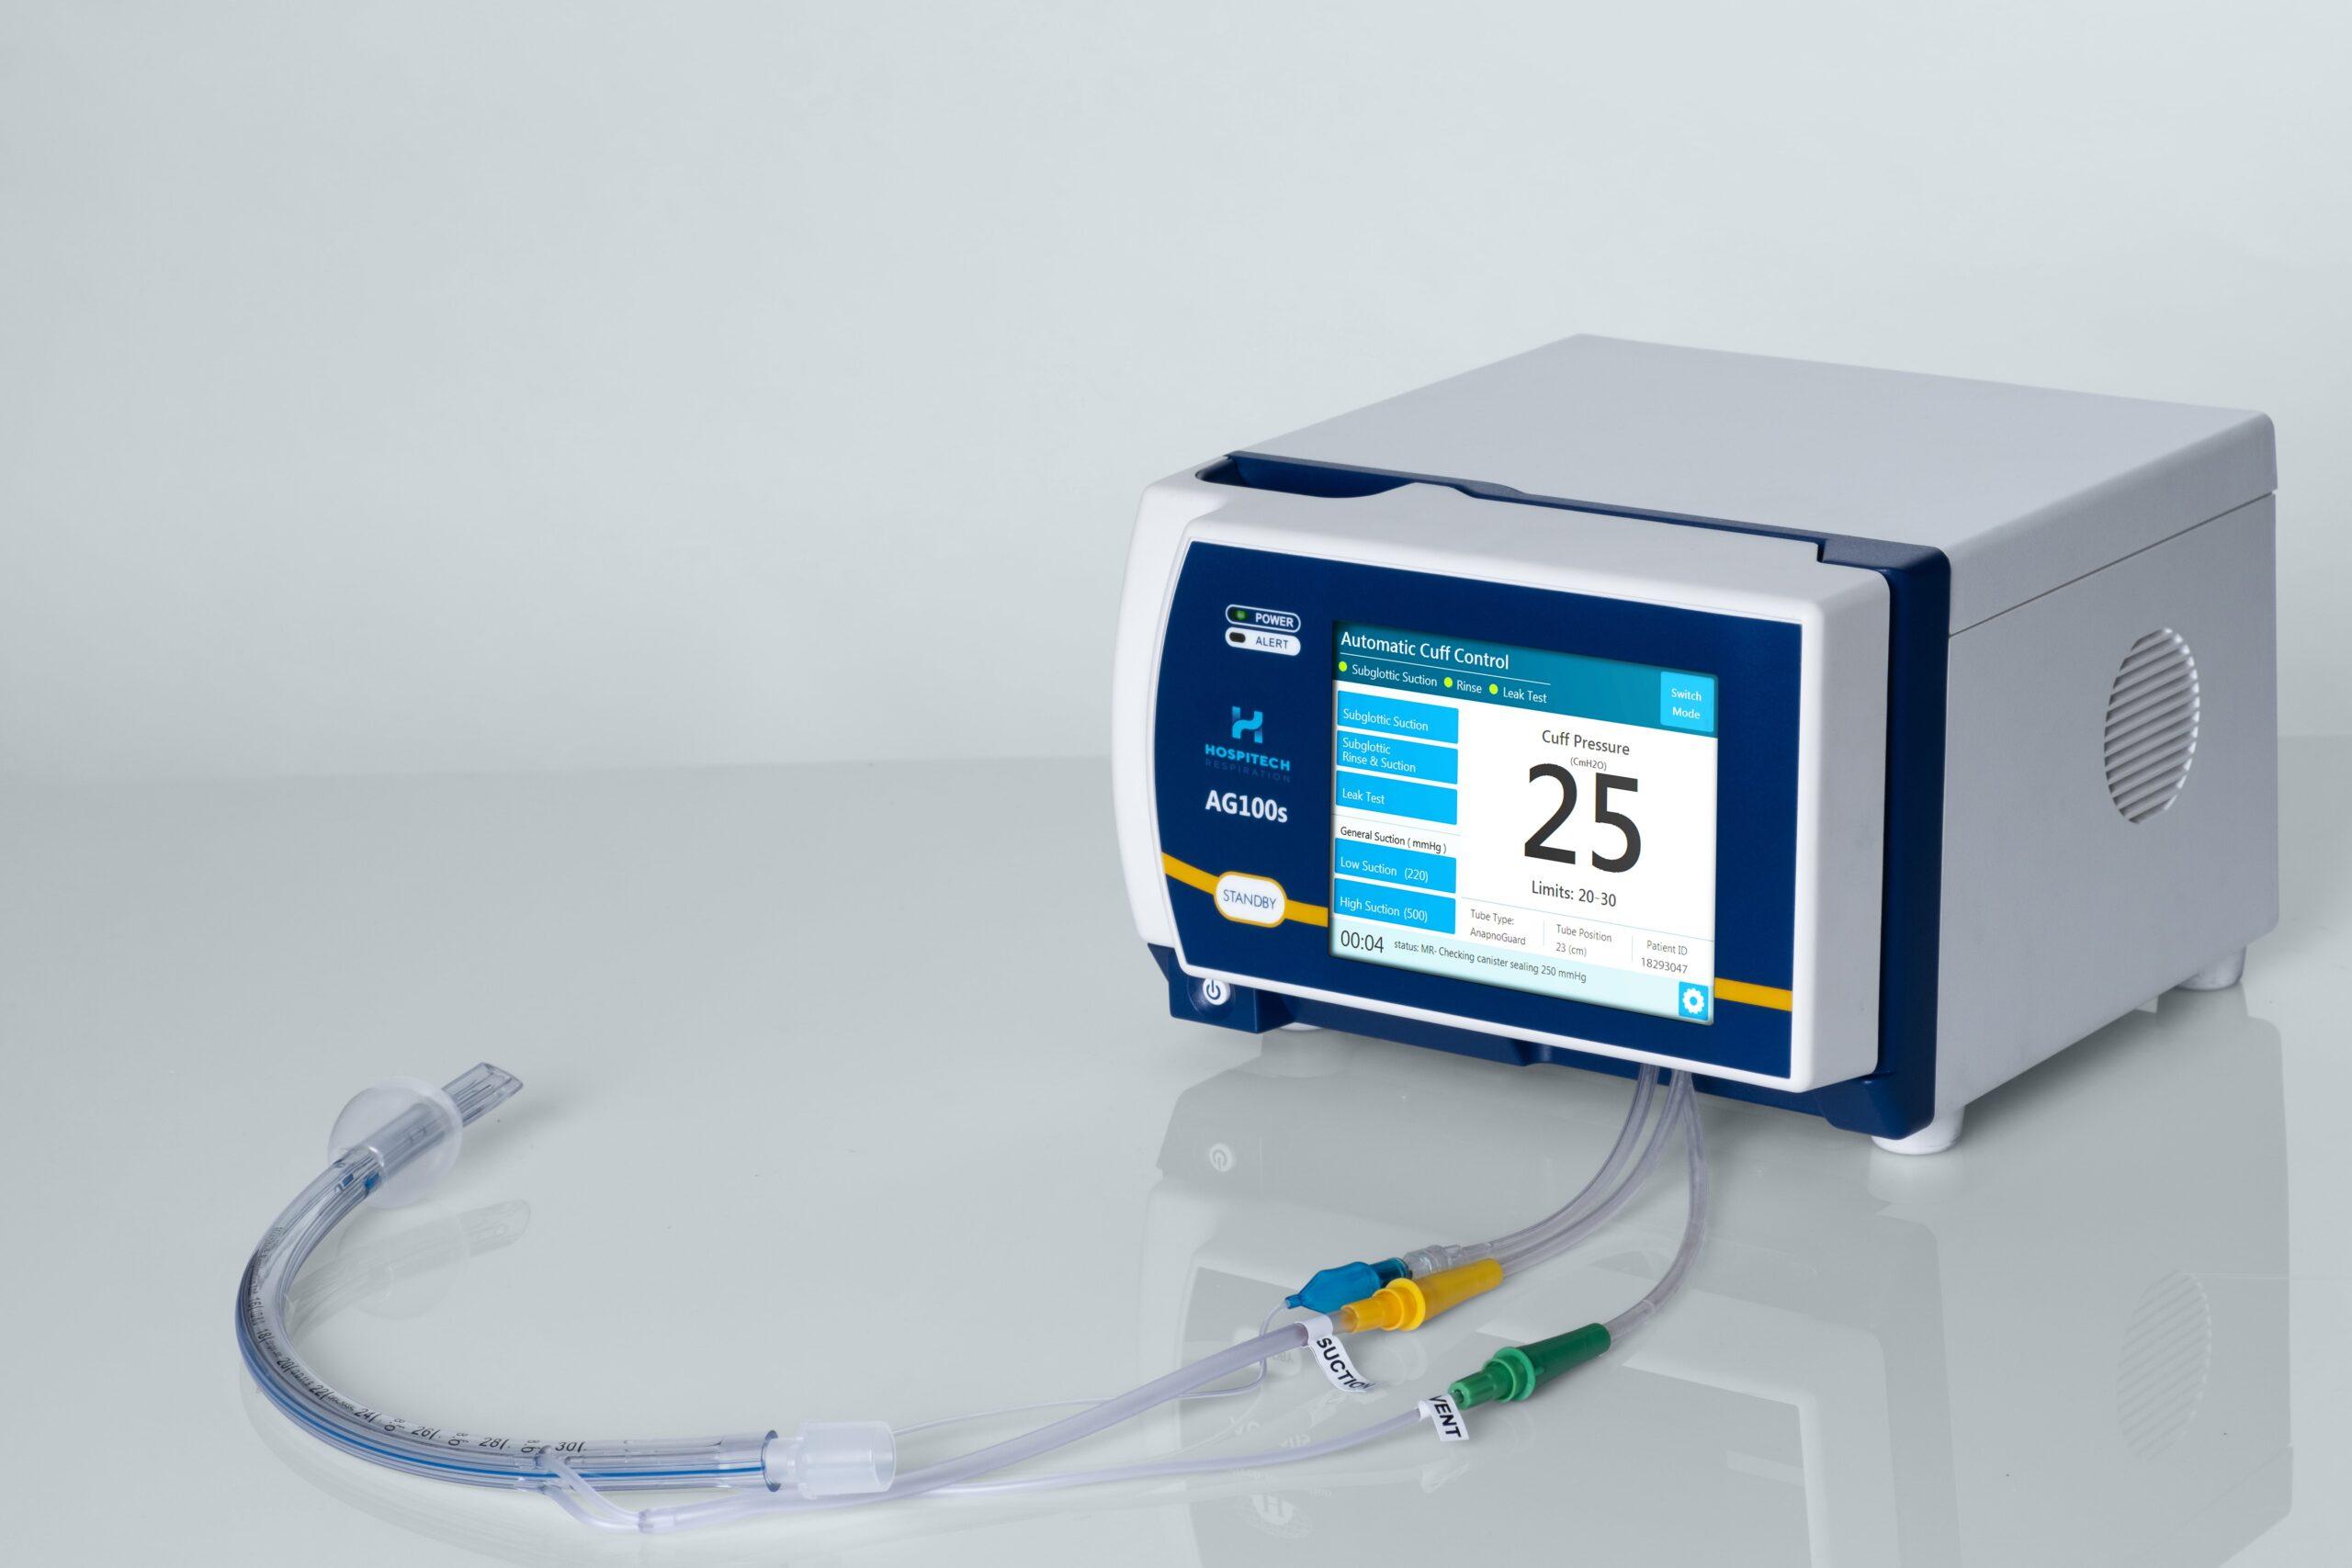 ventilator complications covid-19 anapnoguard